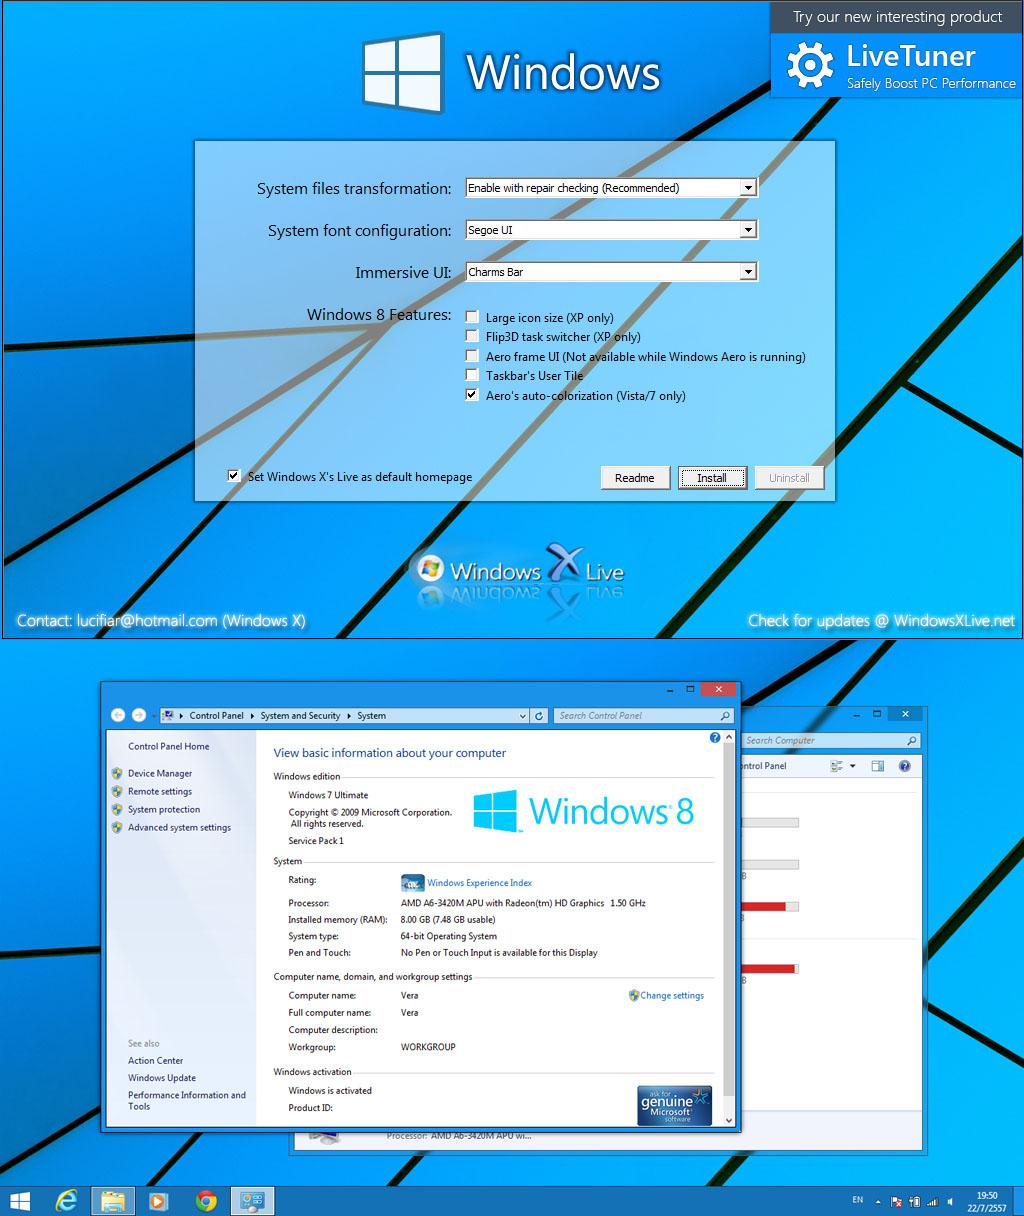 Como instalar o windows 8 transformation pack 7. 0 [2013] youtube.